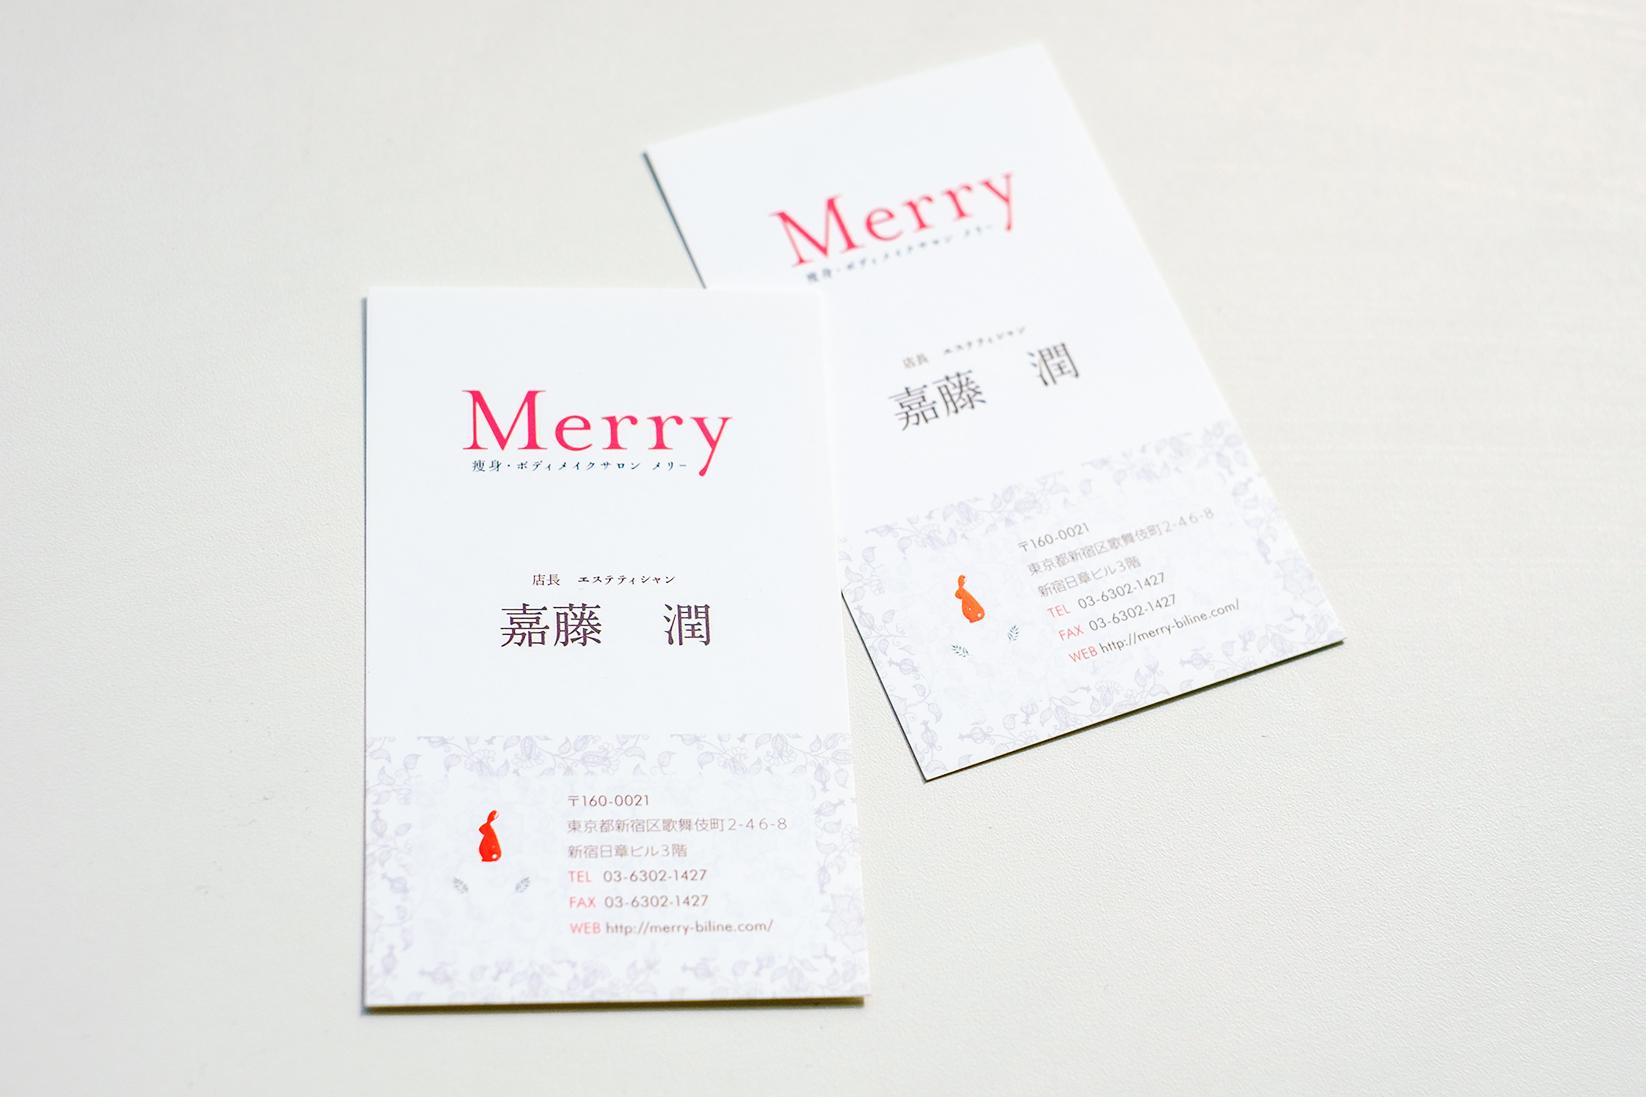 merry-dtp-01.jpg